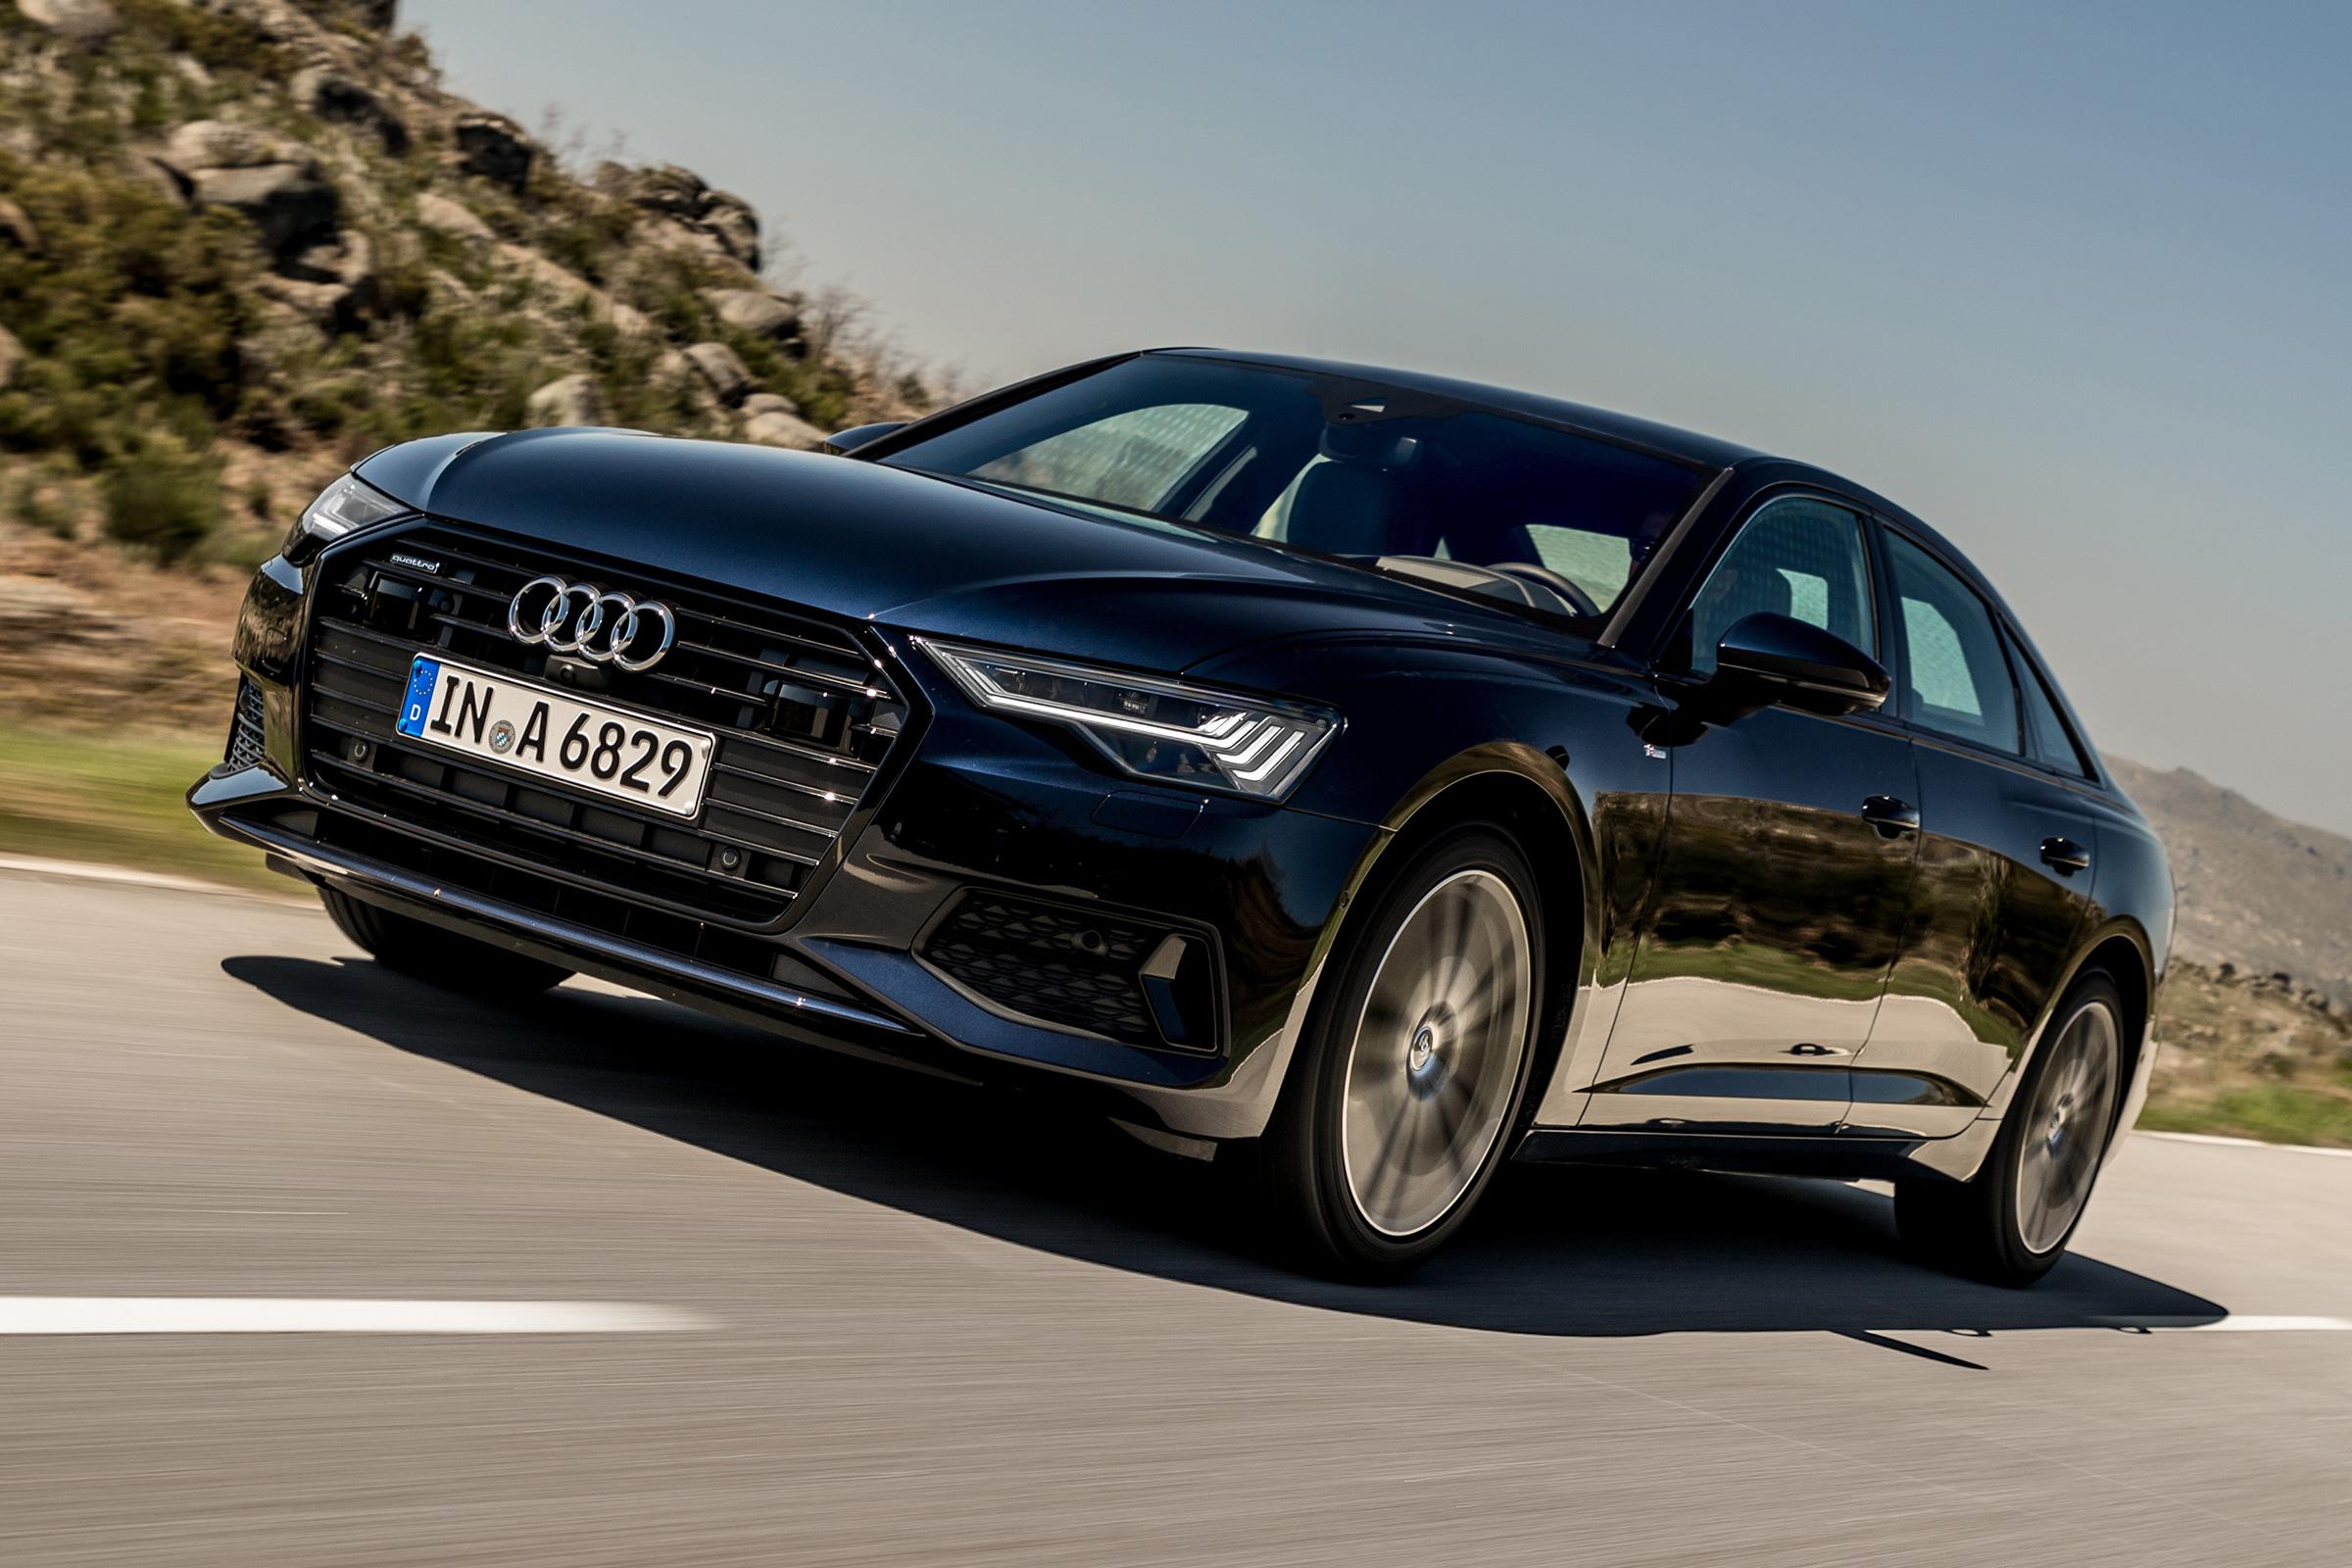 Kekurangan Audi A6 Diesel Perbandingan Harga